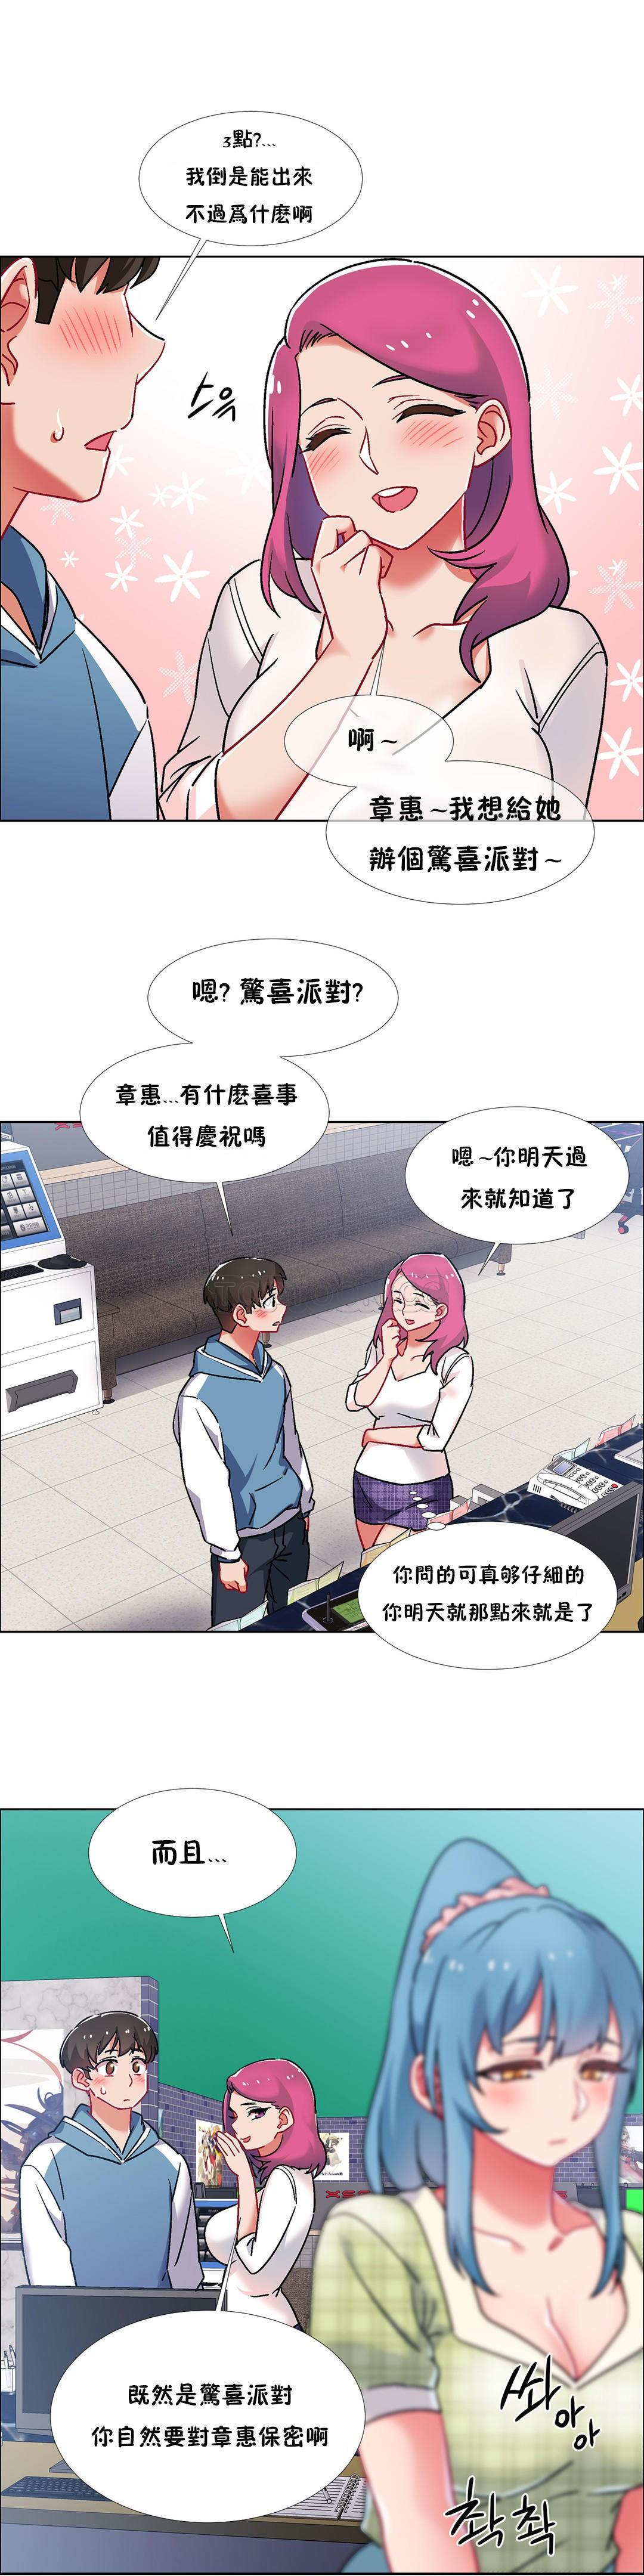 [Studio Wannabe] Rental Girls | 出租女郎 Ch. 33-58 [Chinese]  第二季 完结 147